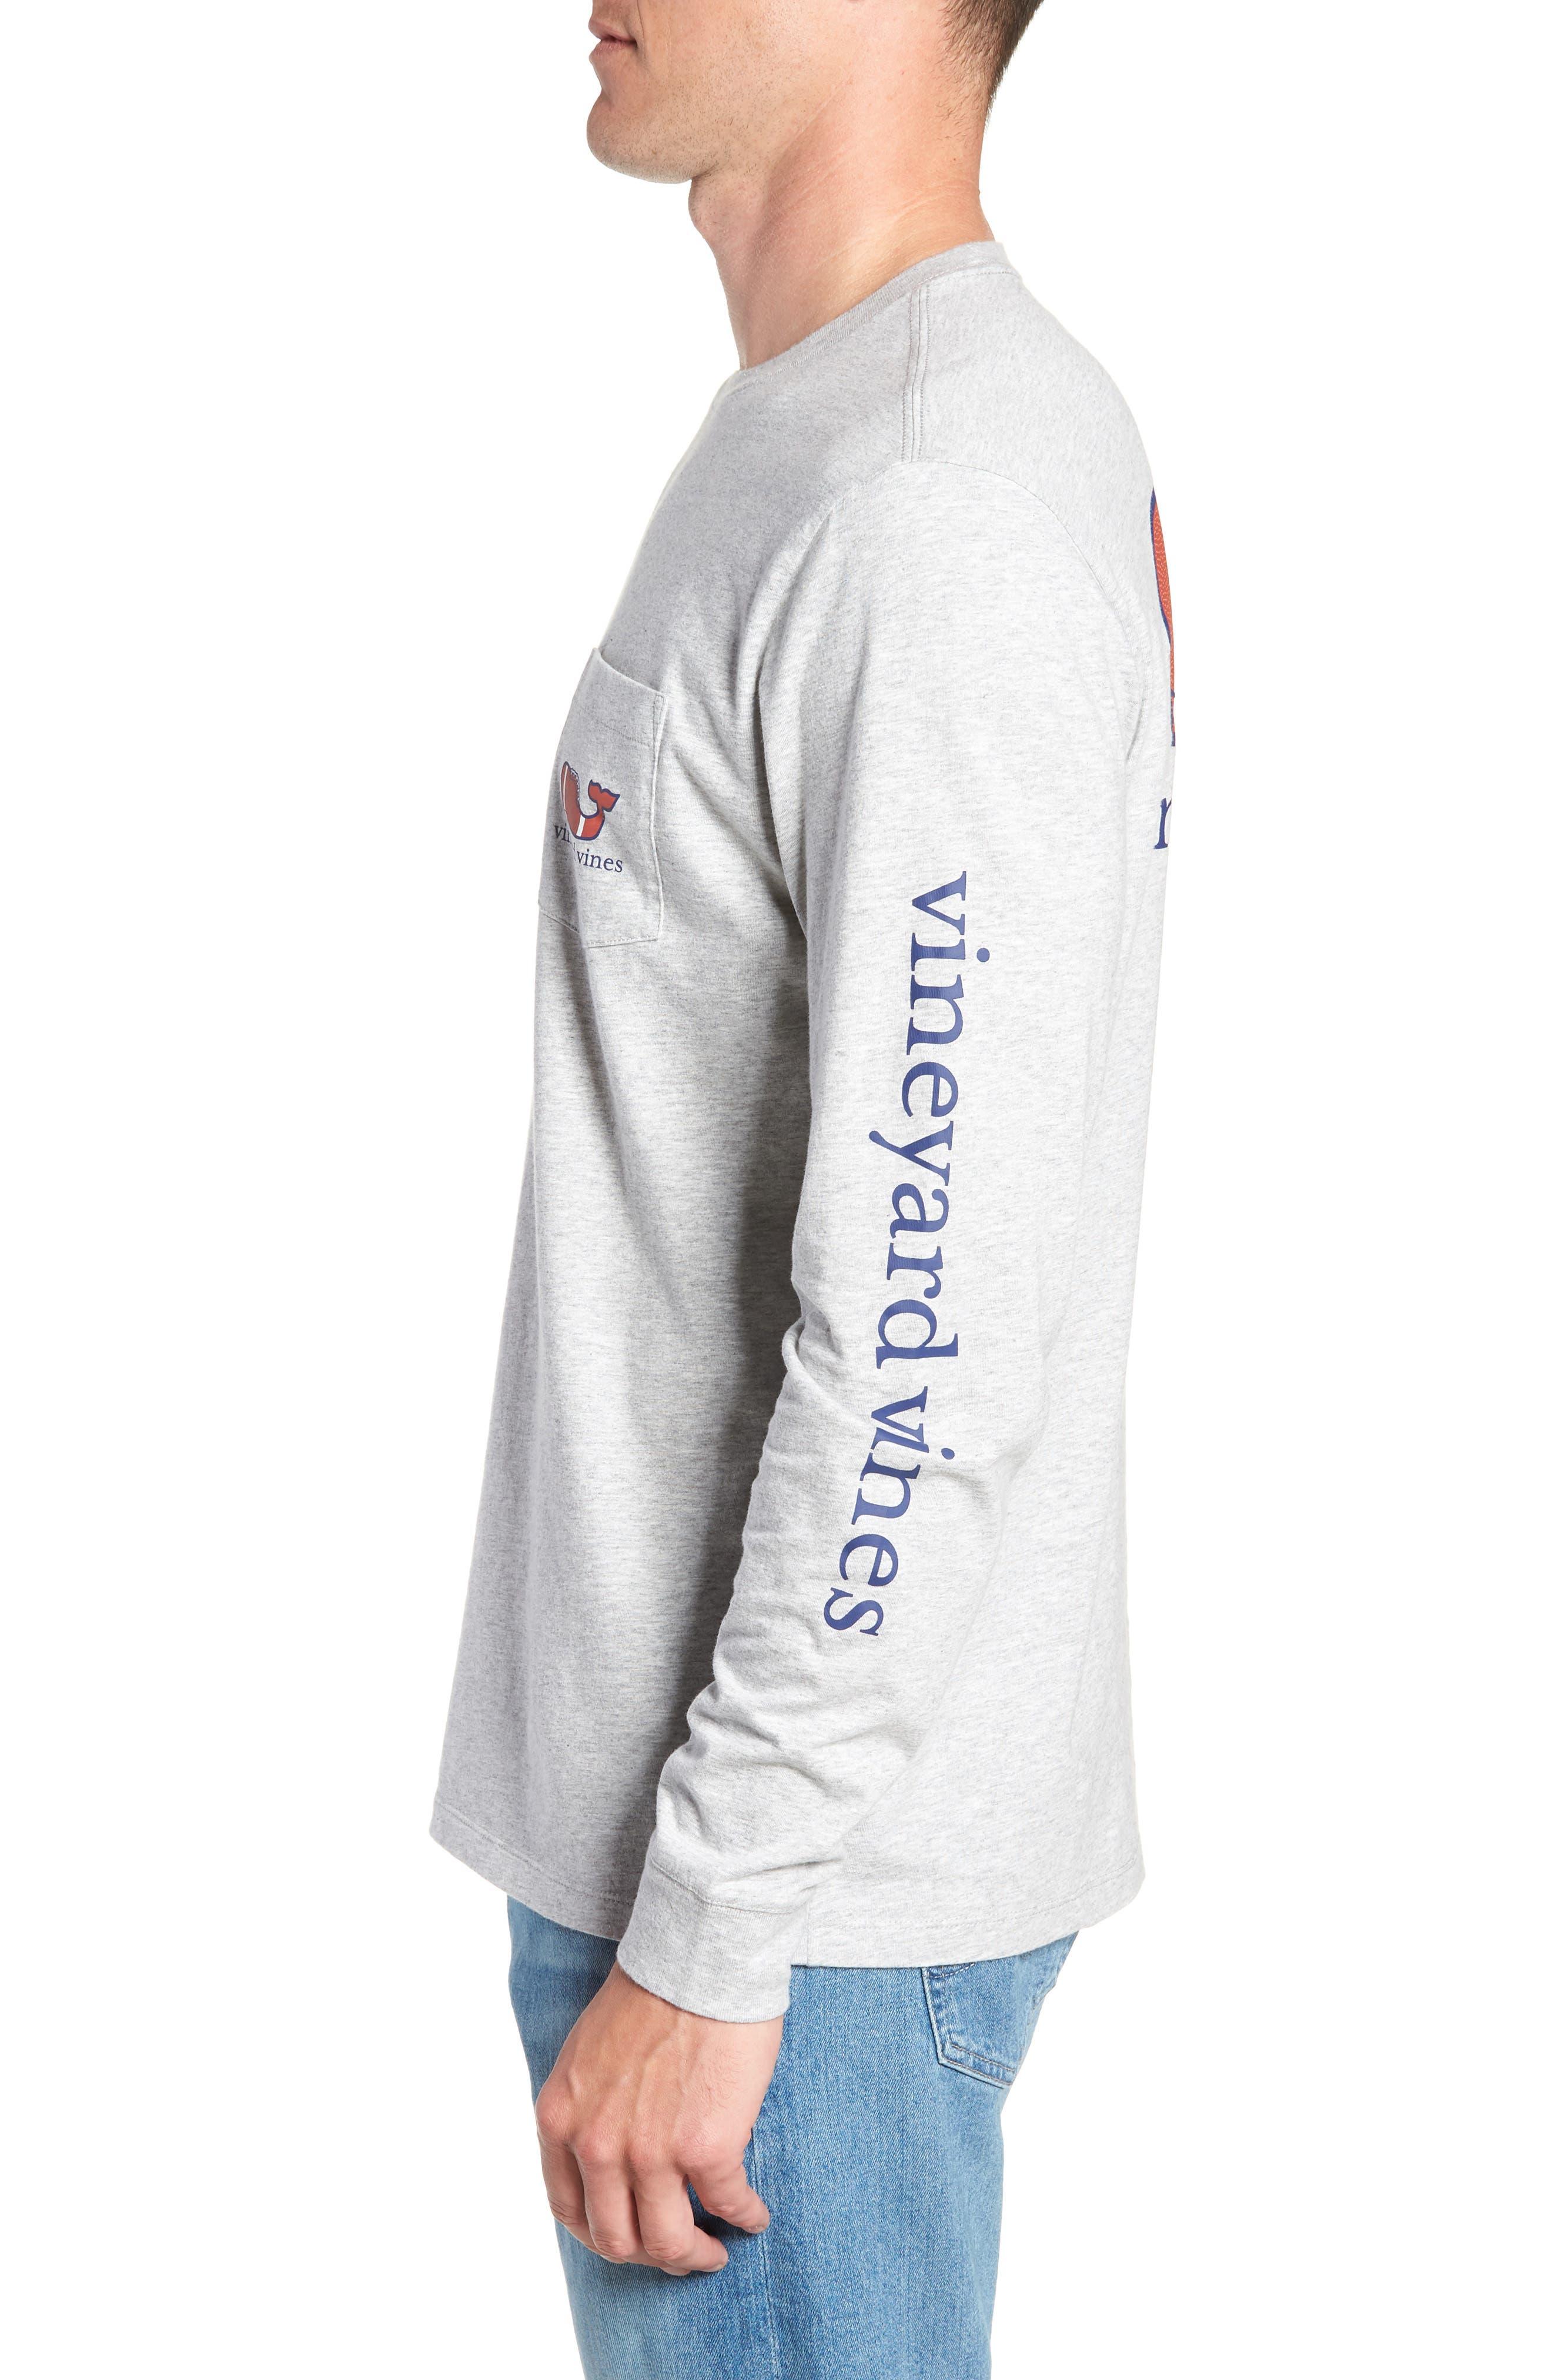 Football Whale Long Sleeve Pocket T-Shirt,                             Alternate thumbnail 3, color,                             GRAY HEATHER